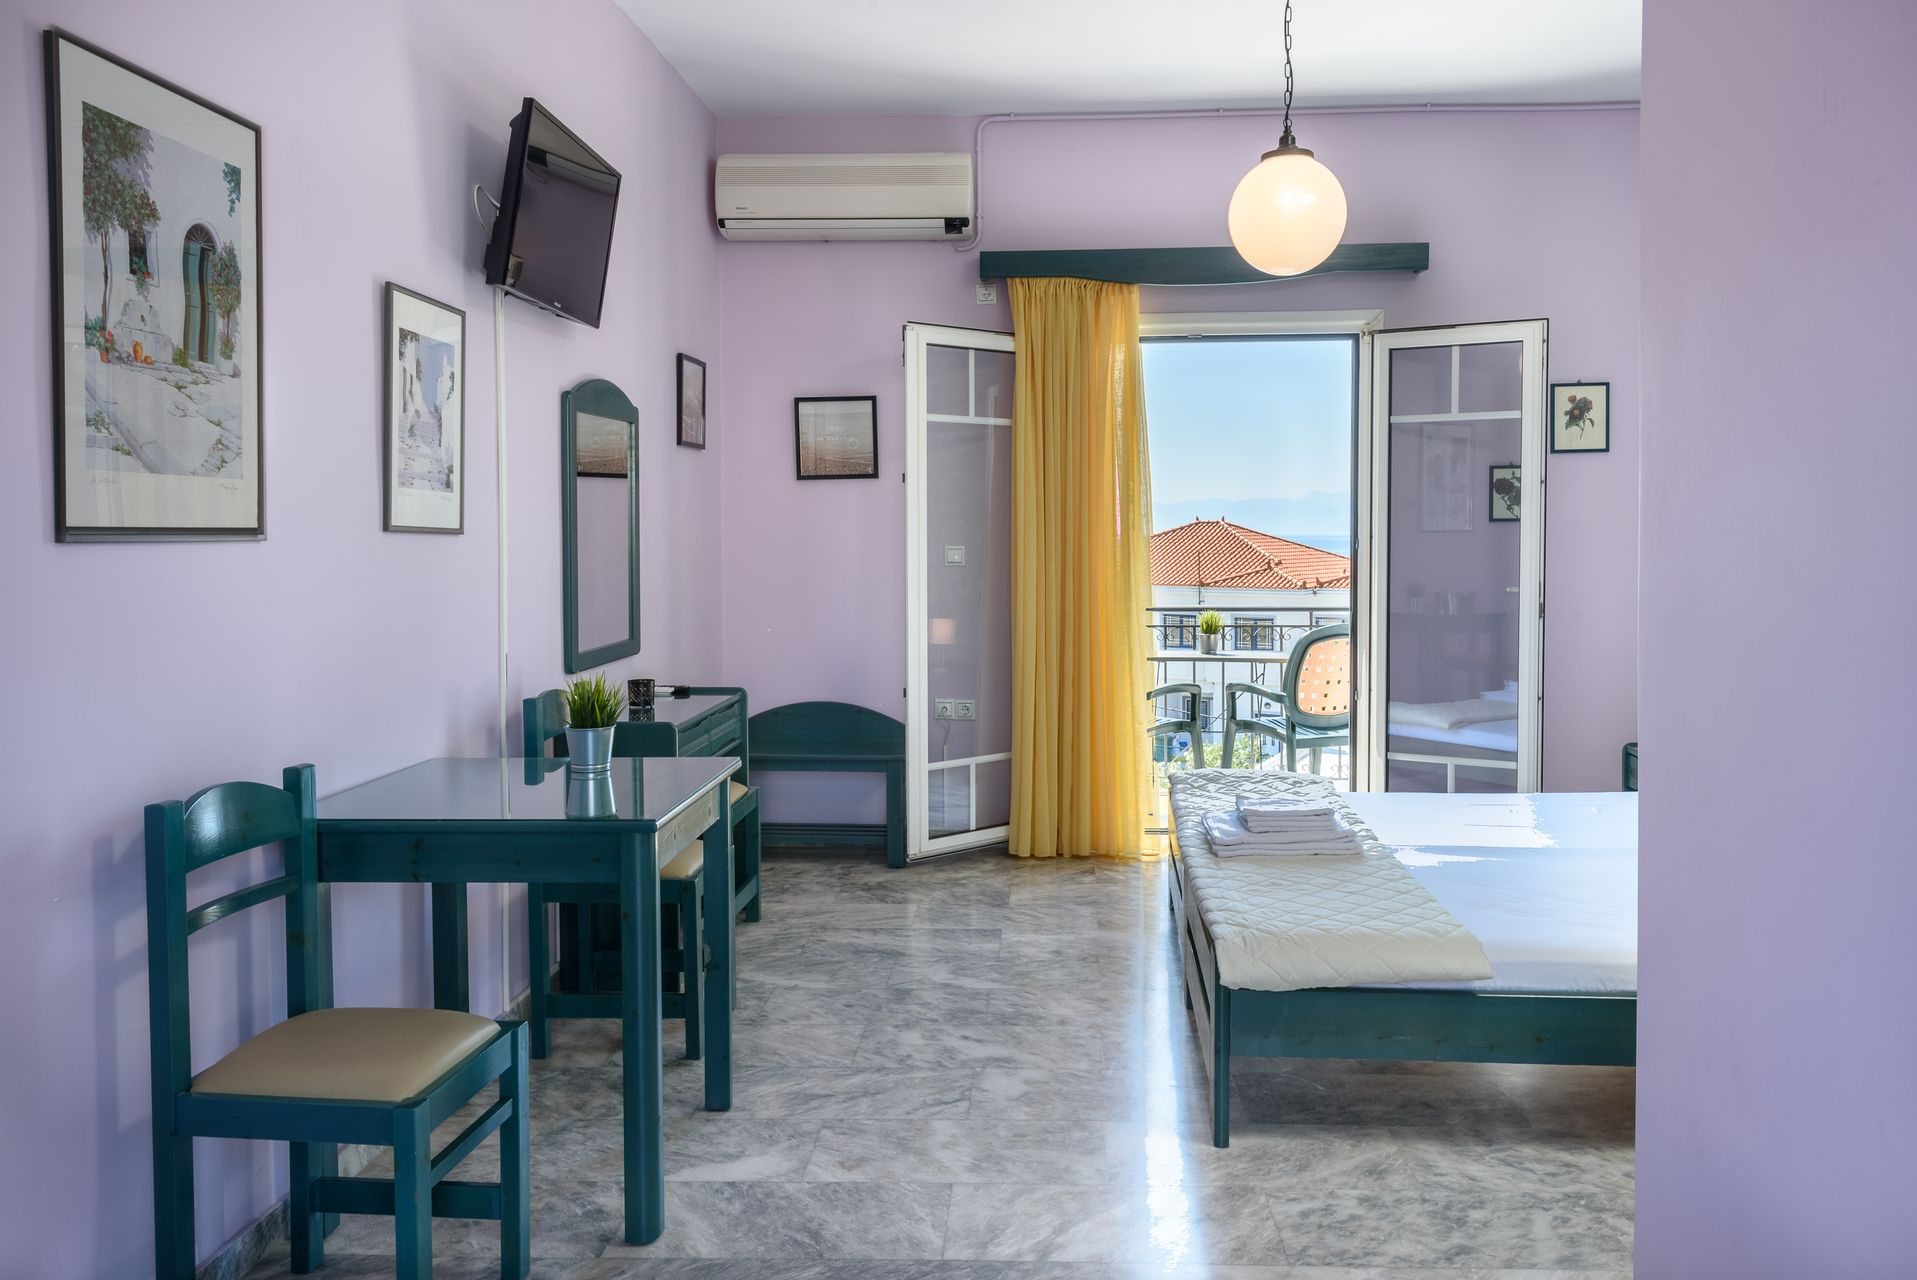 _remvi apartments-0024_resized